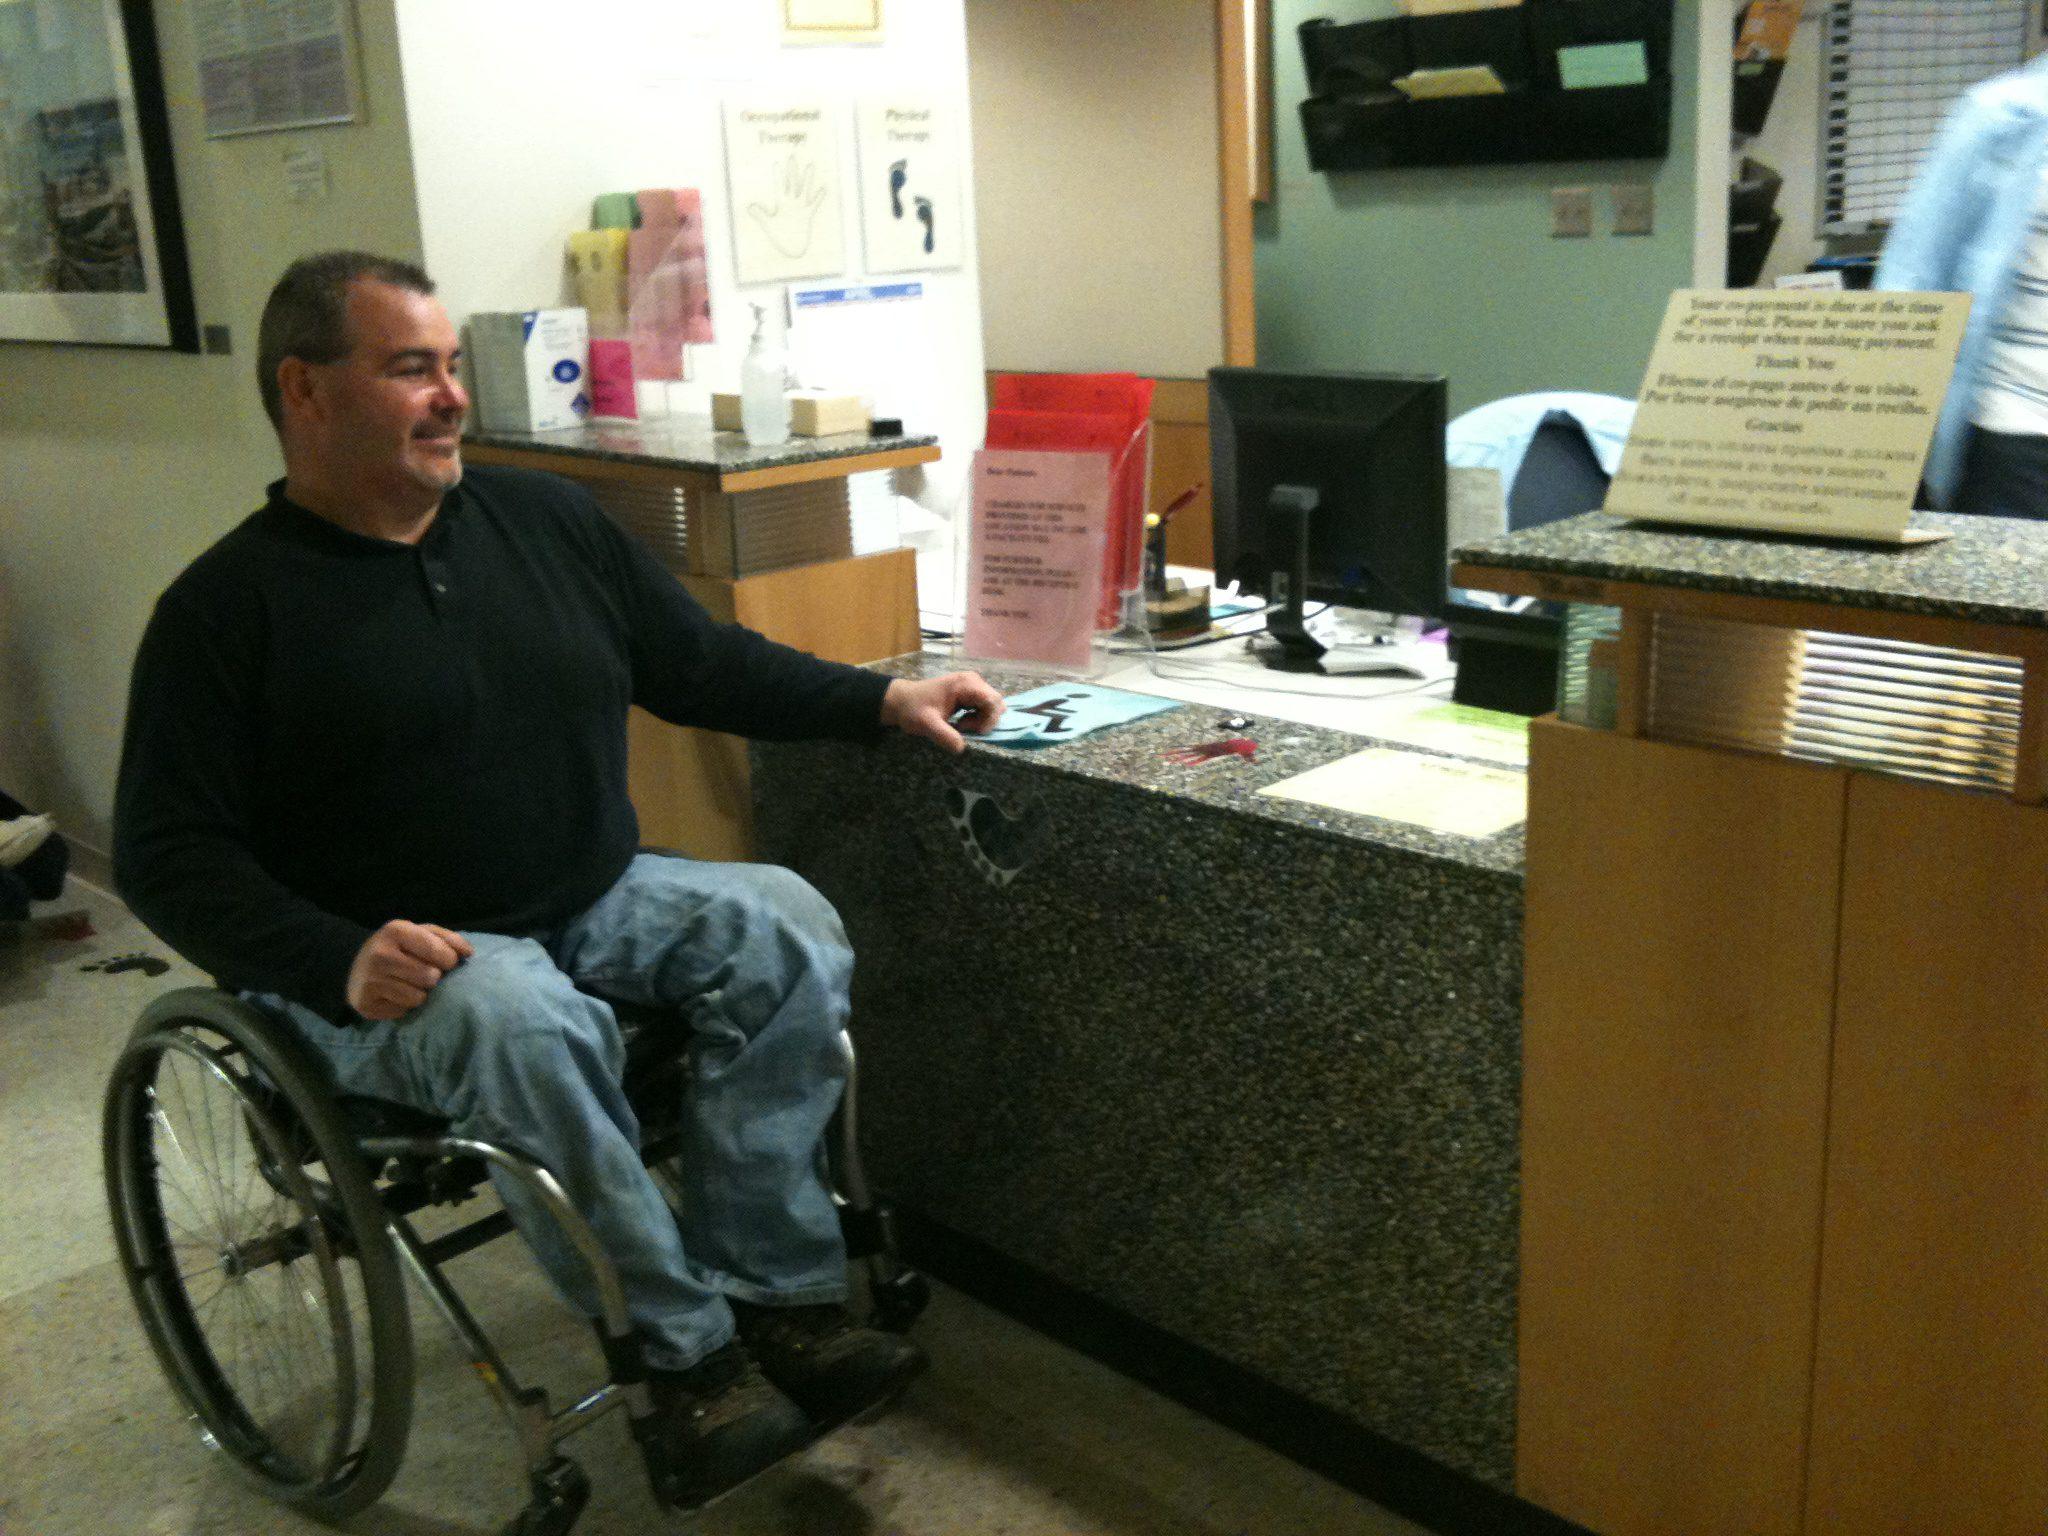 ADA compliance in healthcare setting